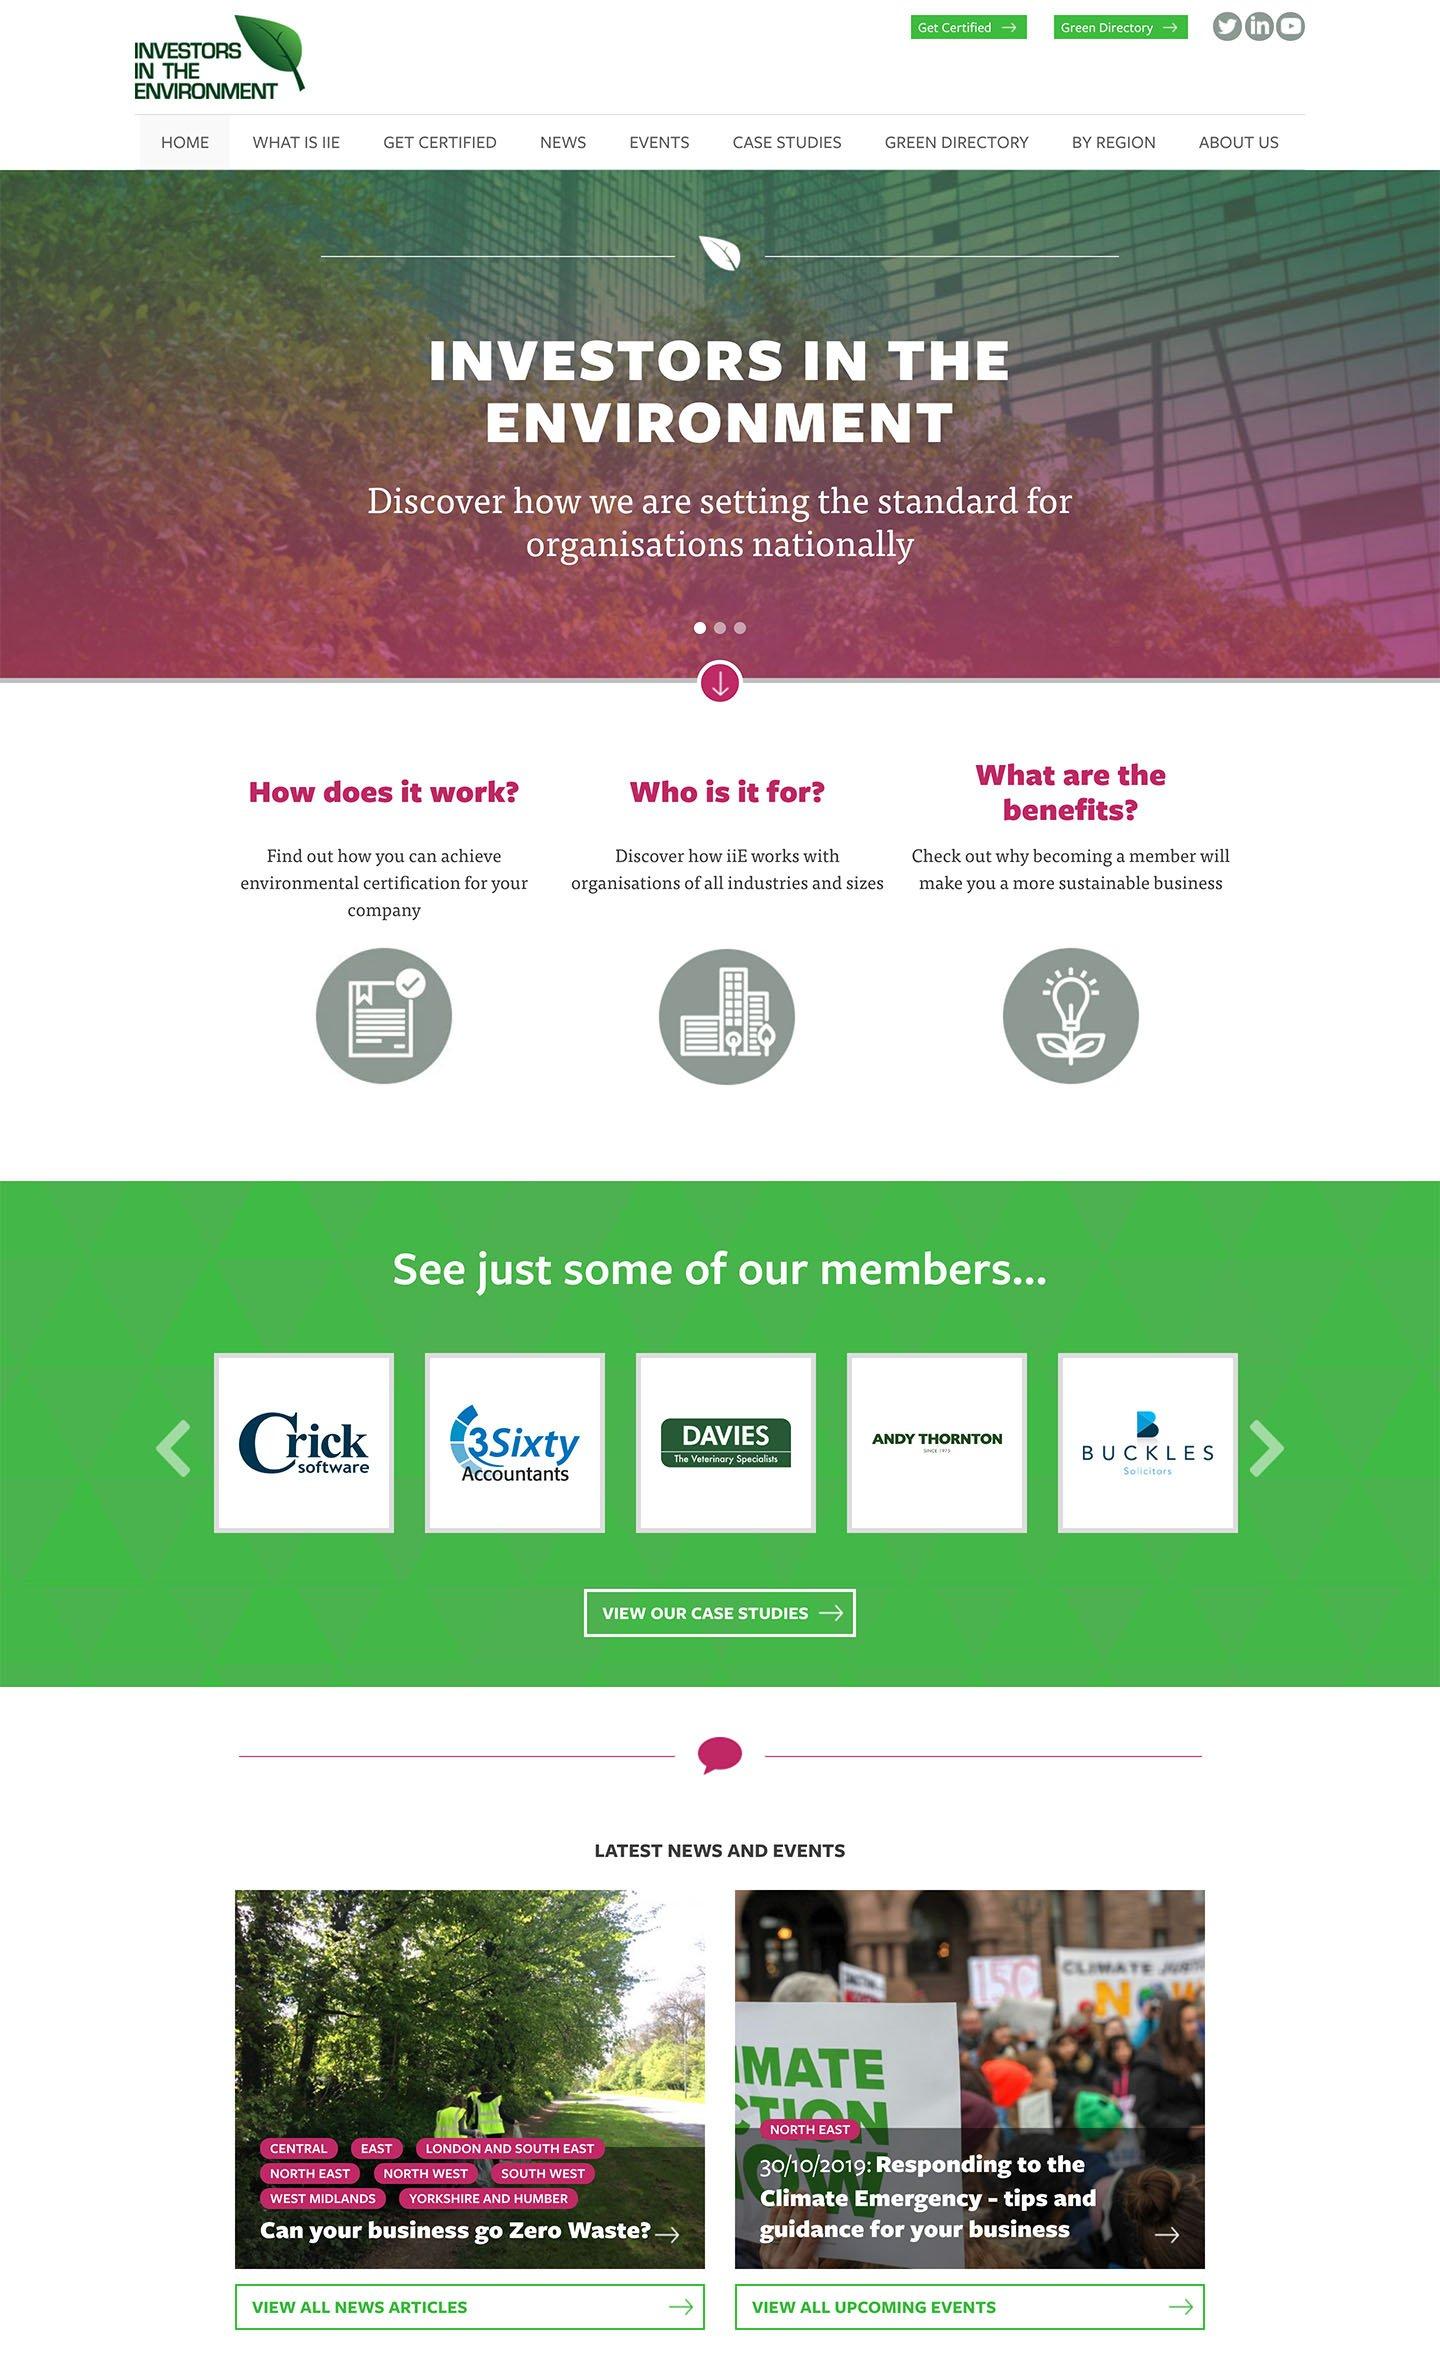 IIE Homepage Screenshot